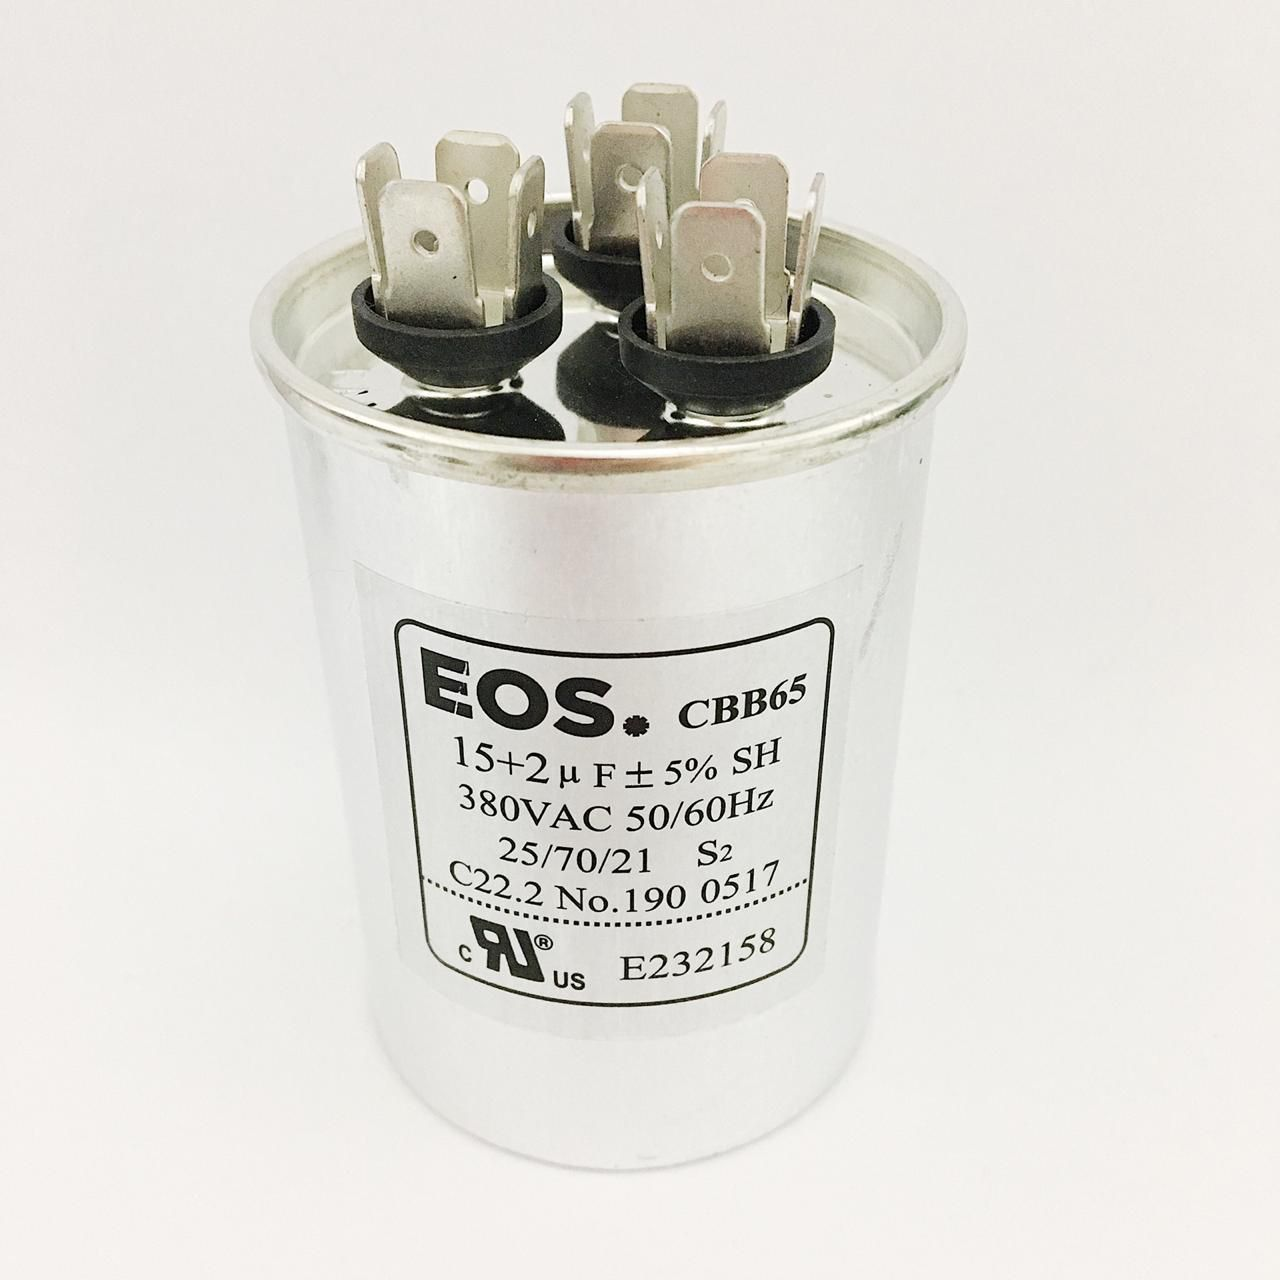 Capacitor 15+2MFD 440VAC EOS